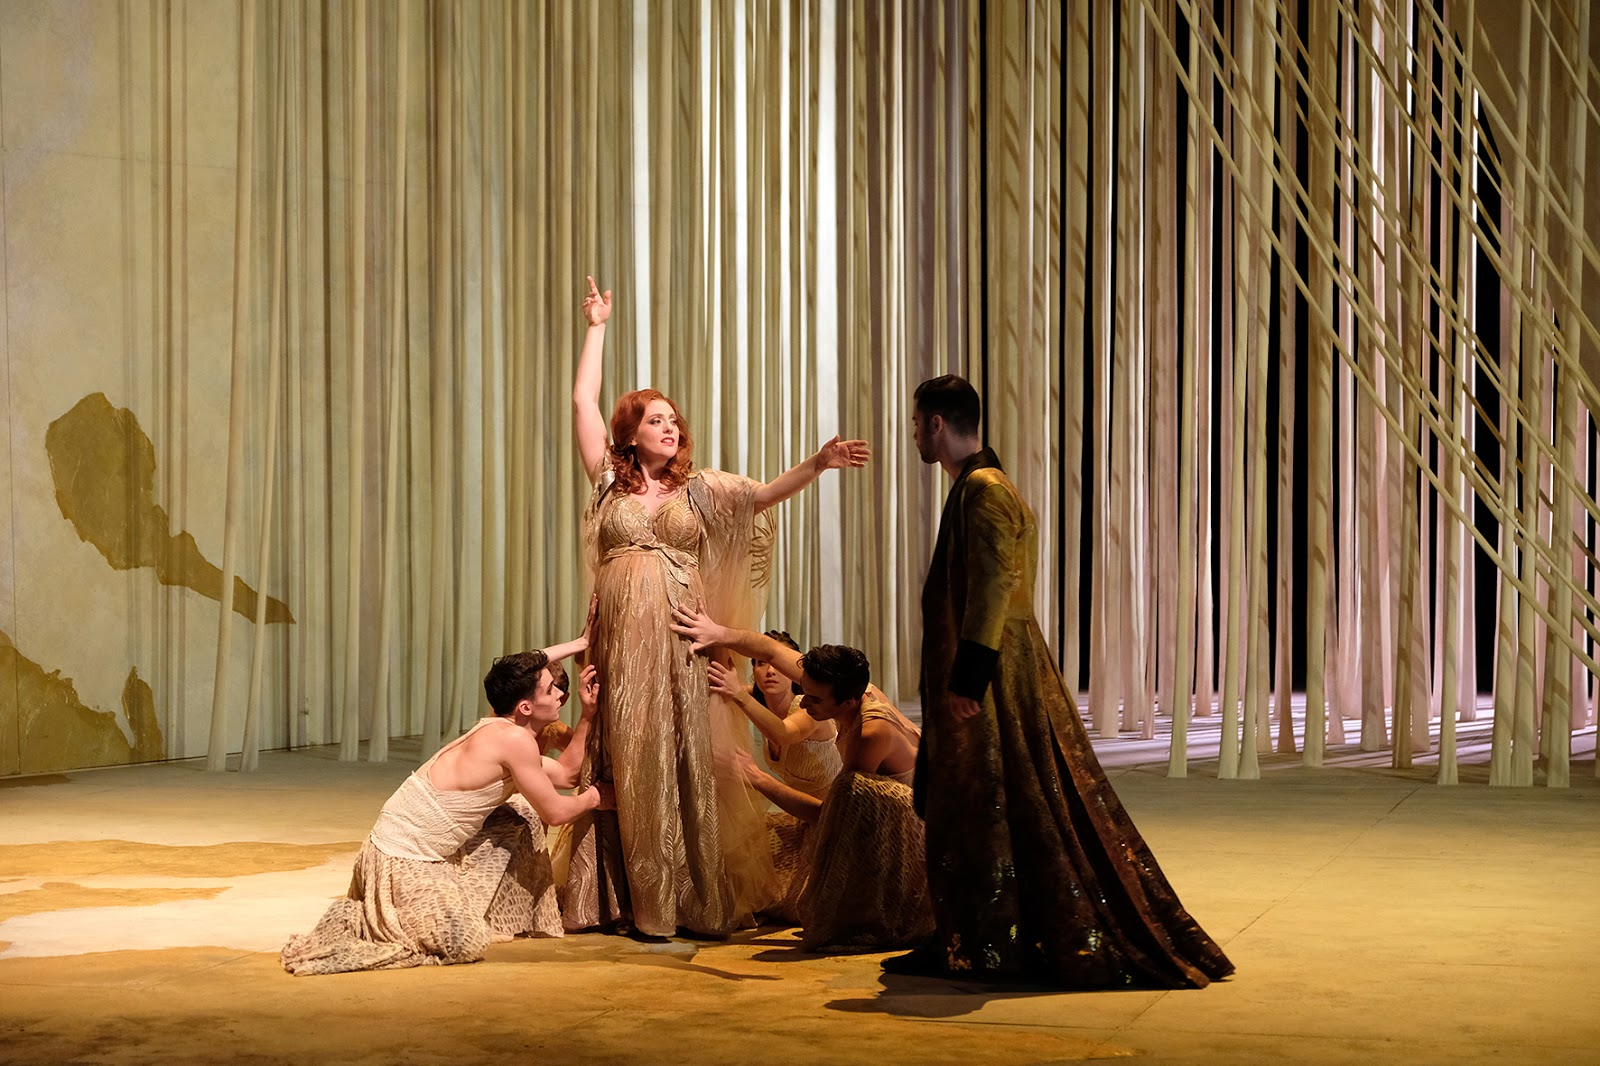 Layla Claire(Alcina),David Hansen(Ruggiero), danseurs (la suite d'Alcina)Photo:Falk von Traubenberg